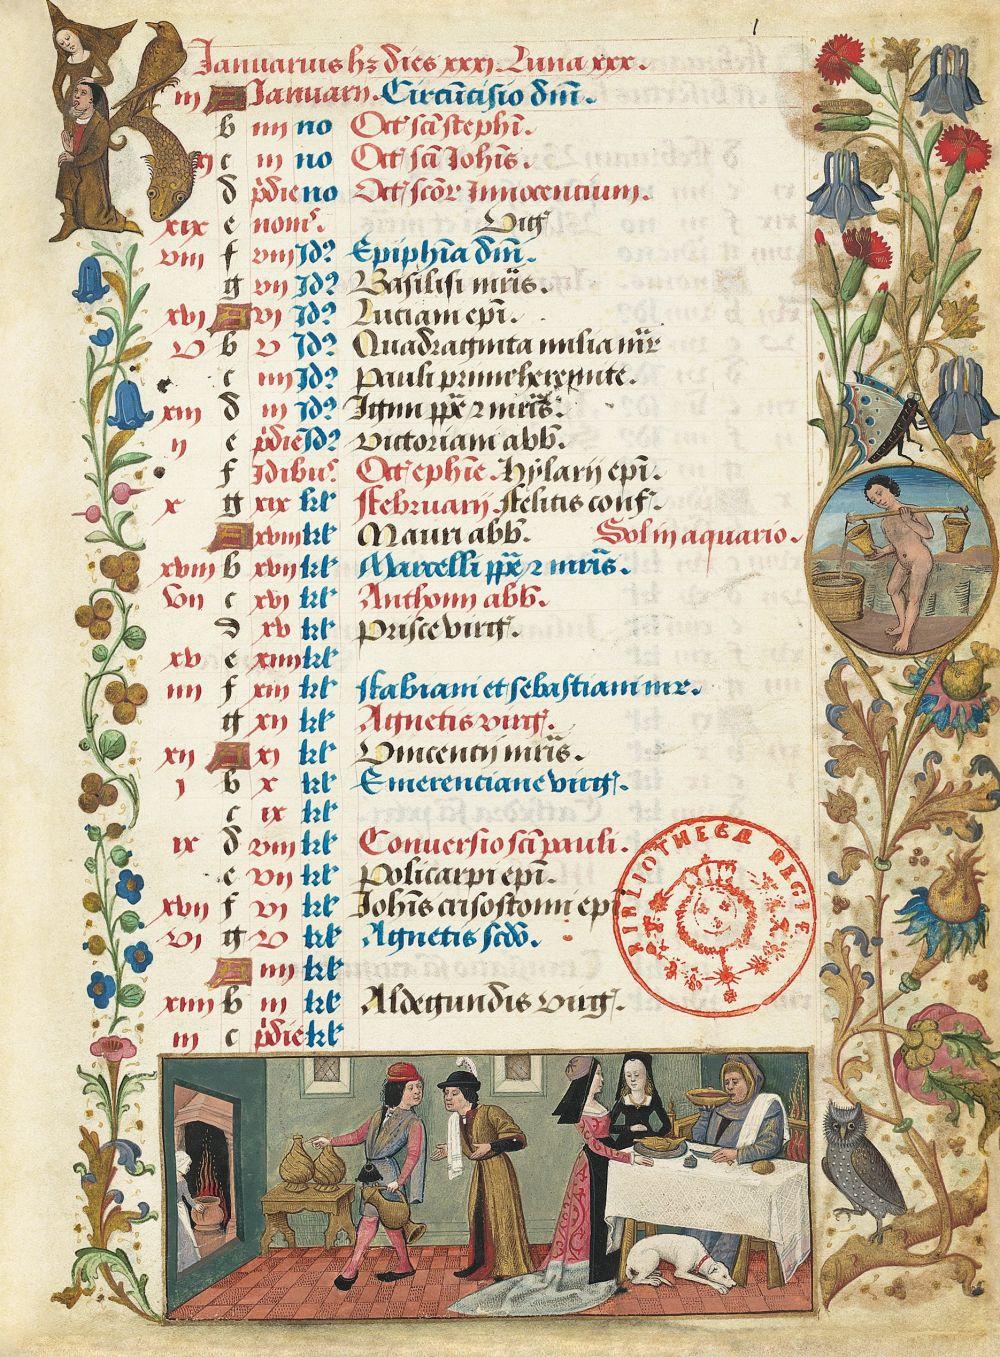 The Hours of Charles of Angoulême Calendar: January(f. 1r)